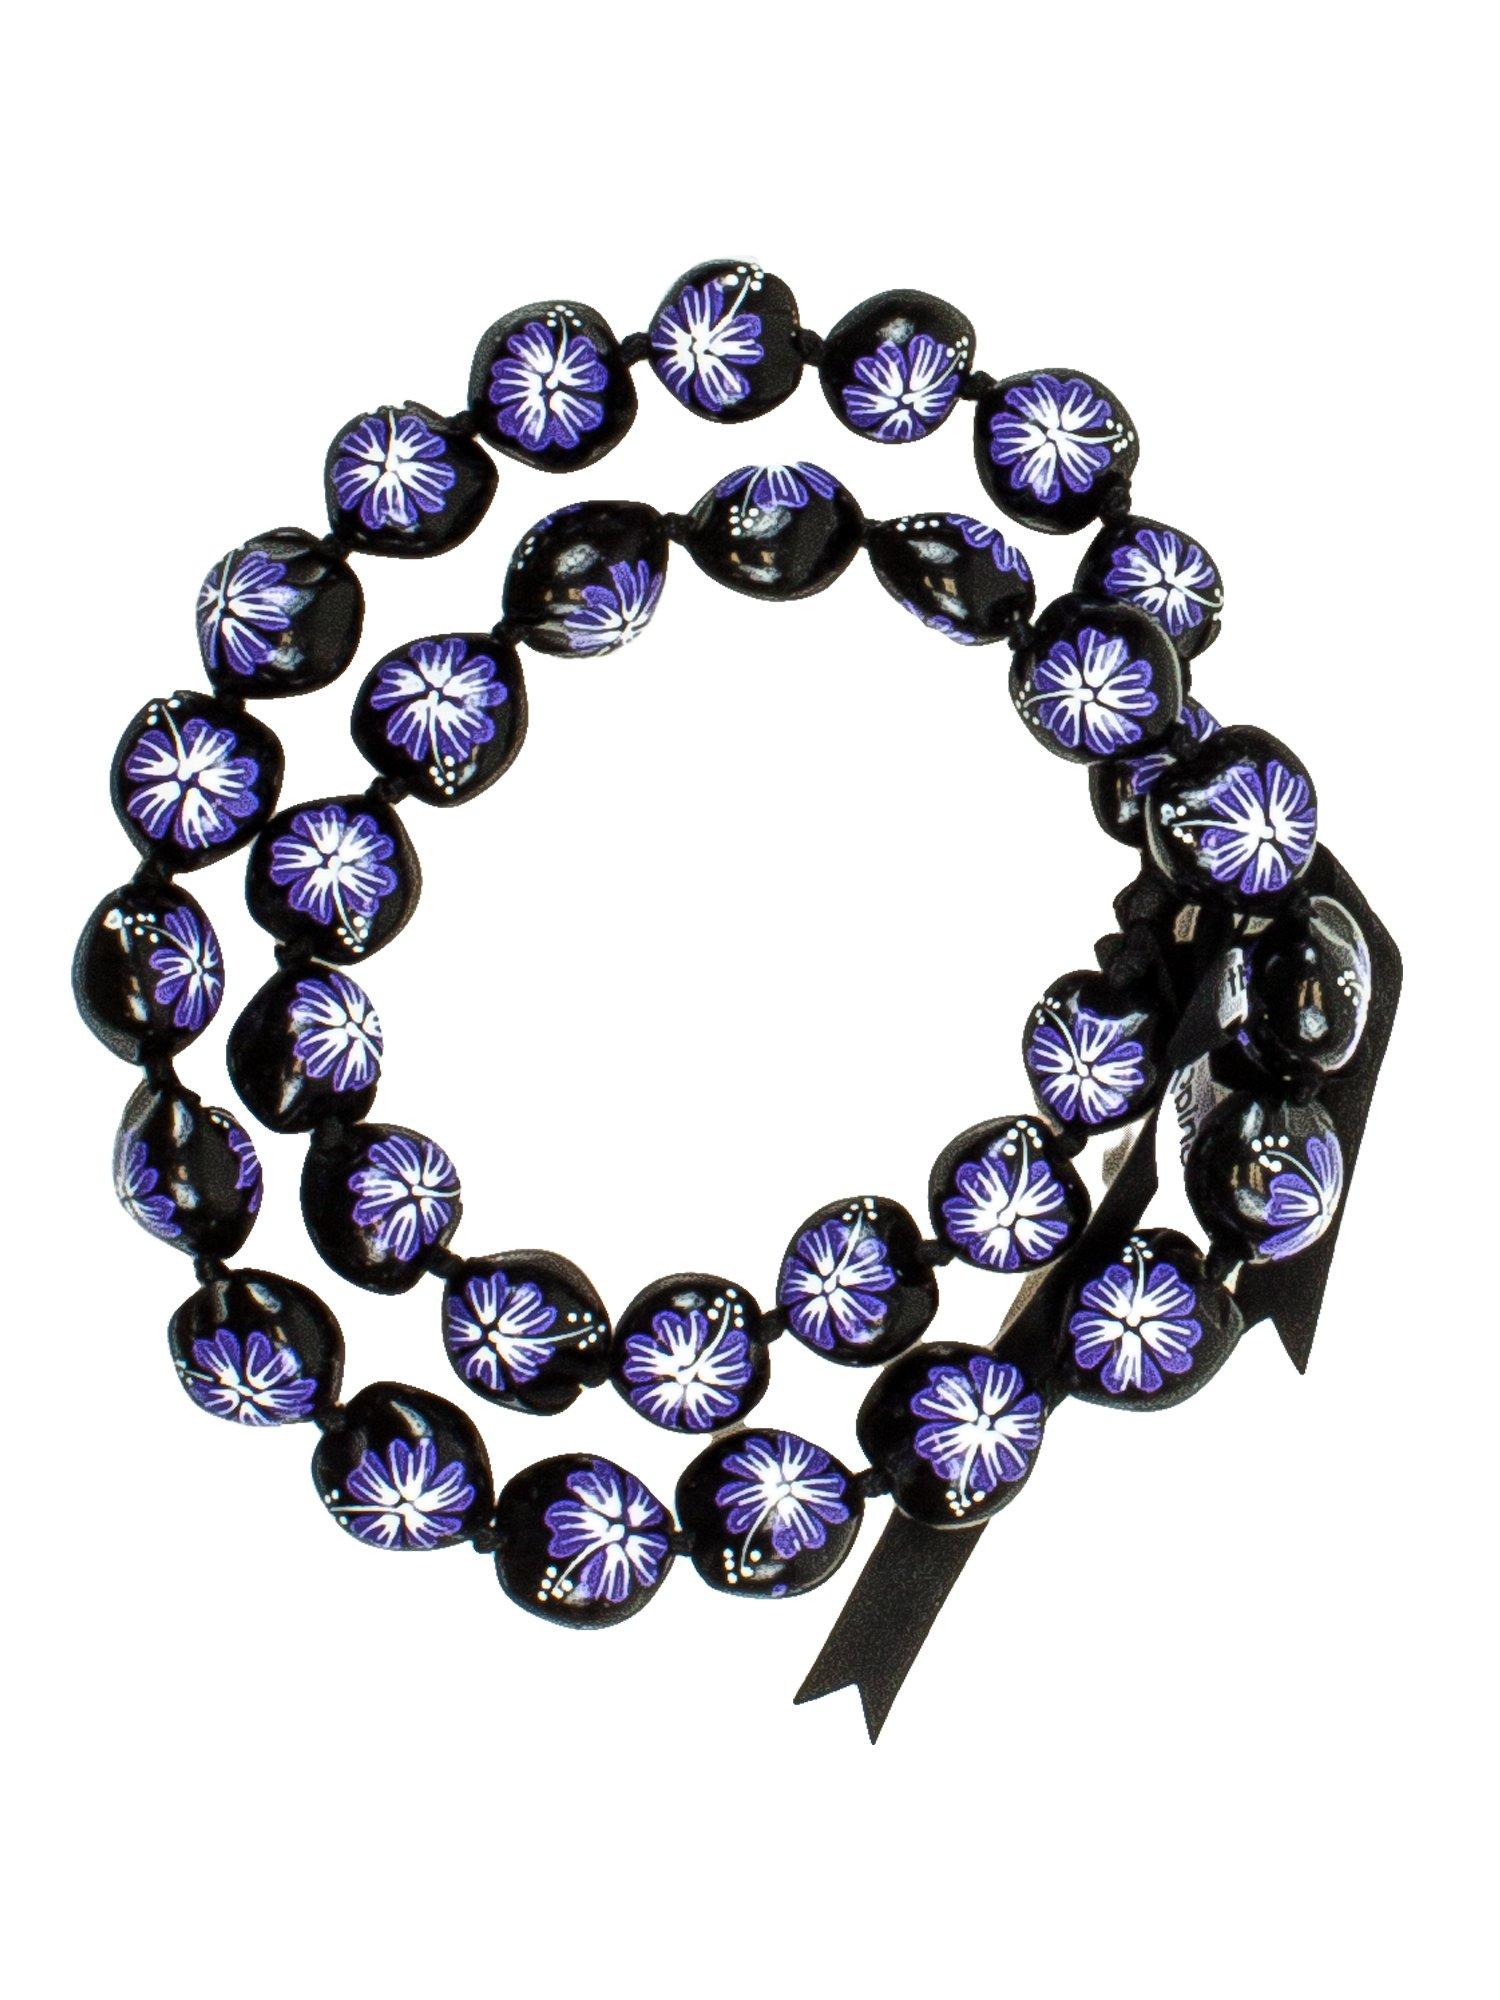 Barbra Collection Hawaiian Style Kukui Nut Lei Hibiscus Flower Hand Painted 32 Nuts (Purple Flower)